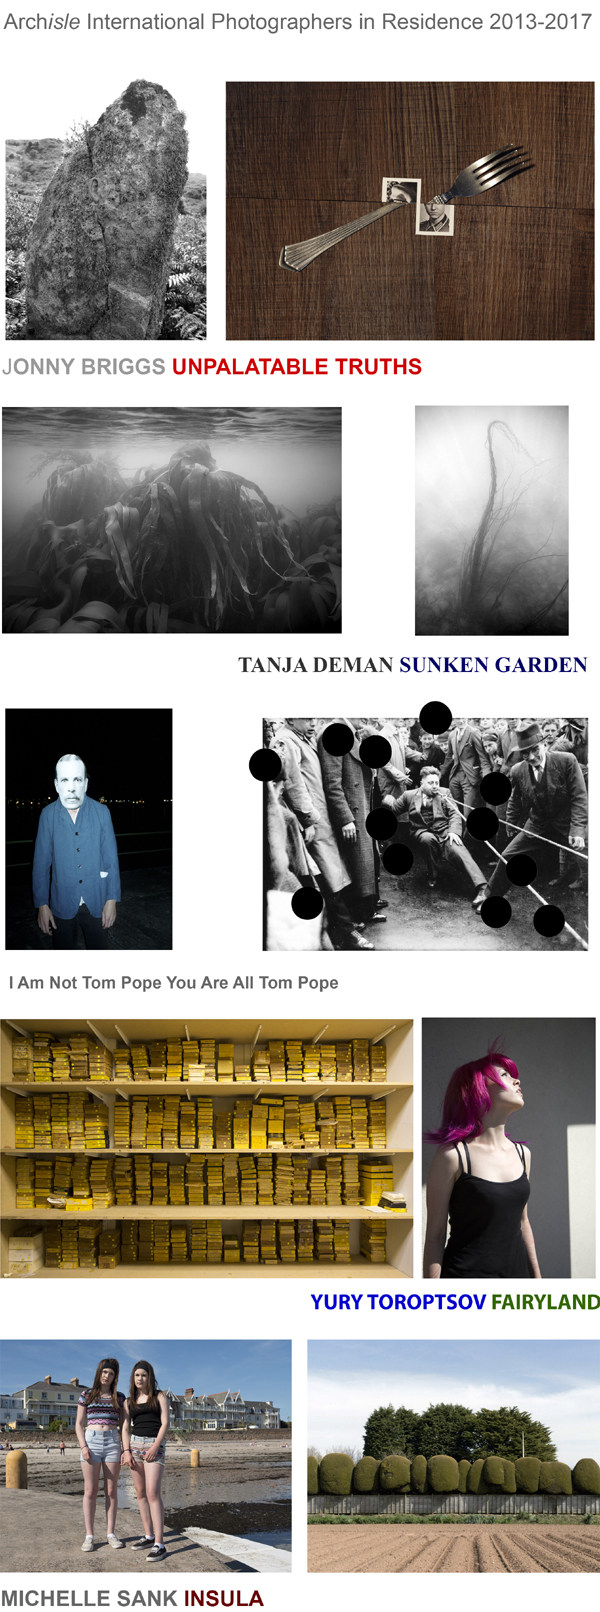 Archisle International Photographers in Residence 2013-2017